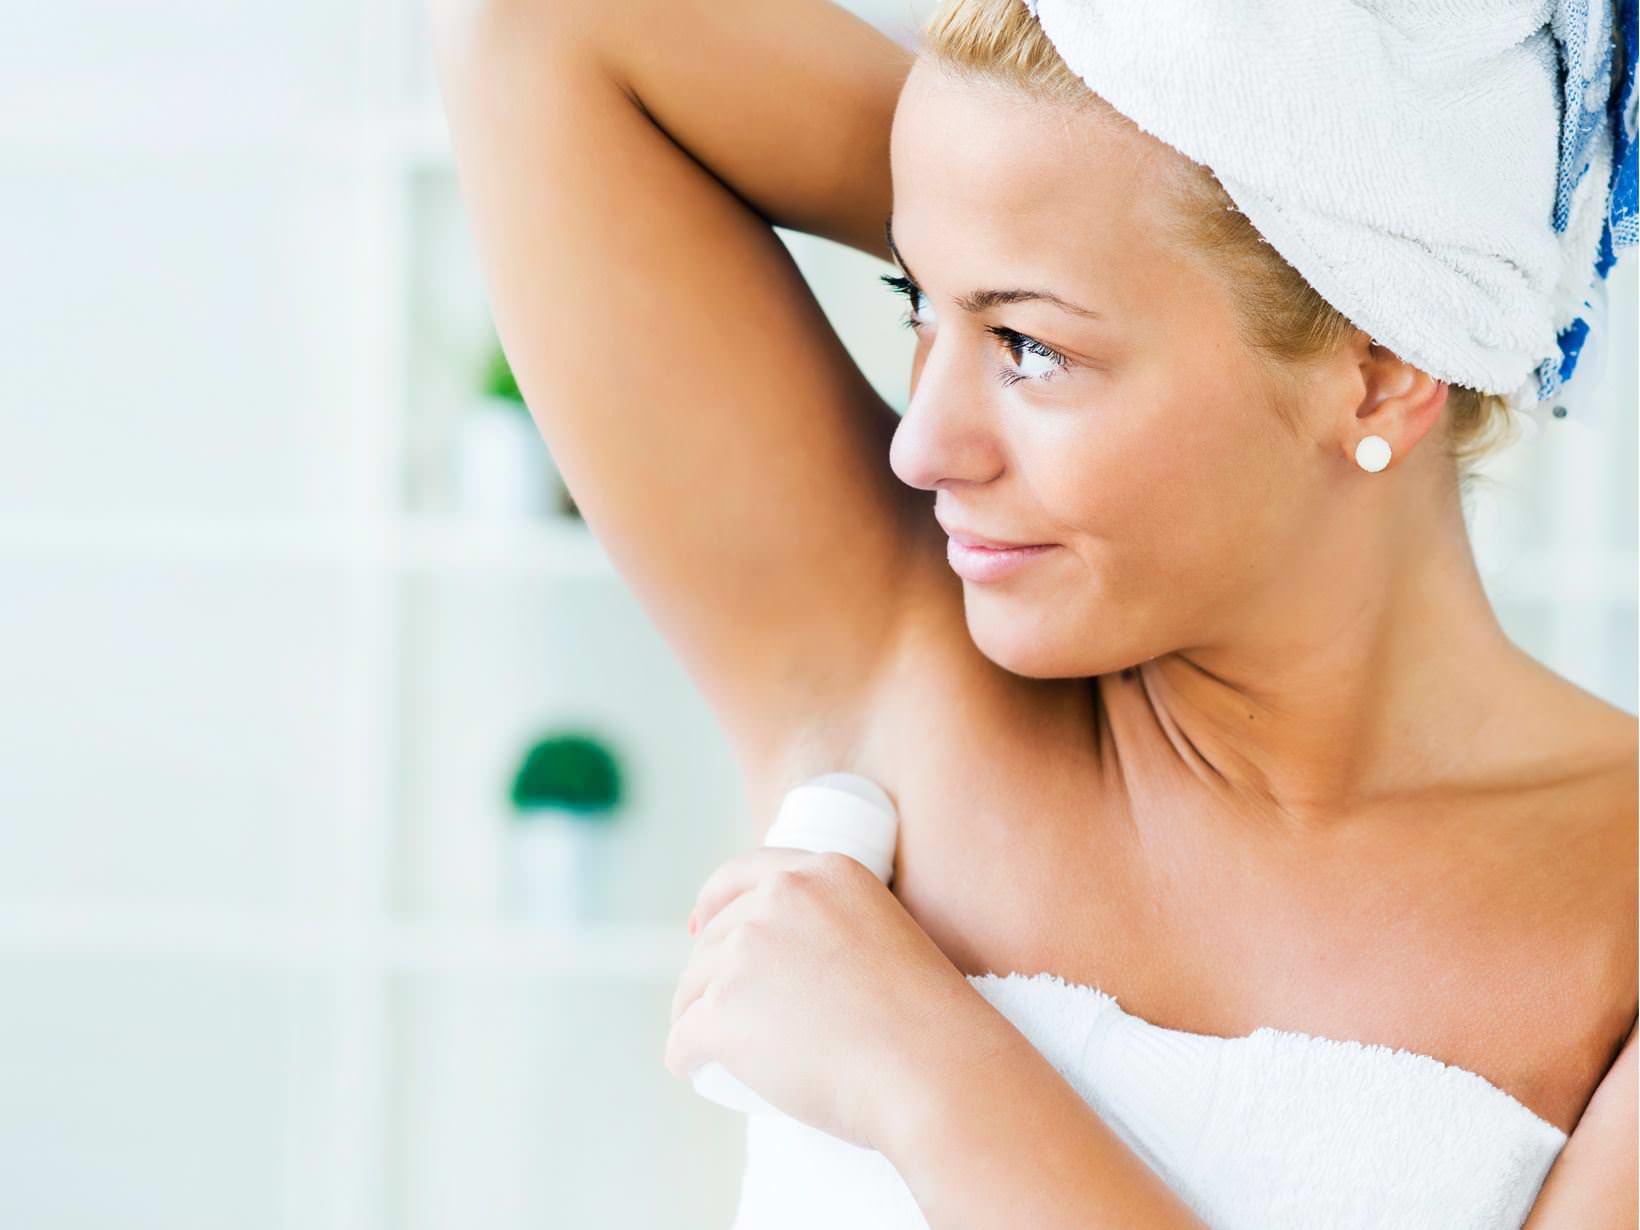 woman-applying-deodorant-in-bathroom